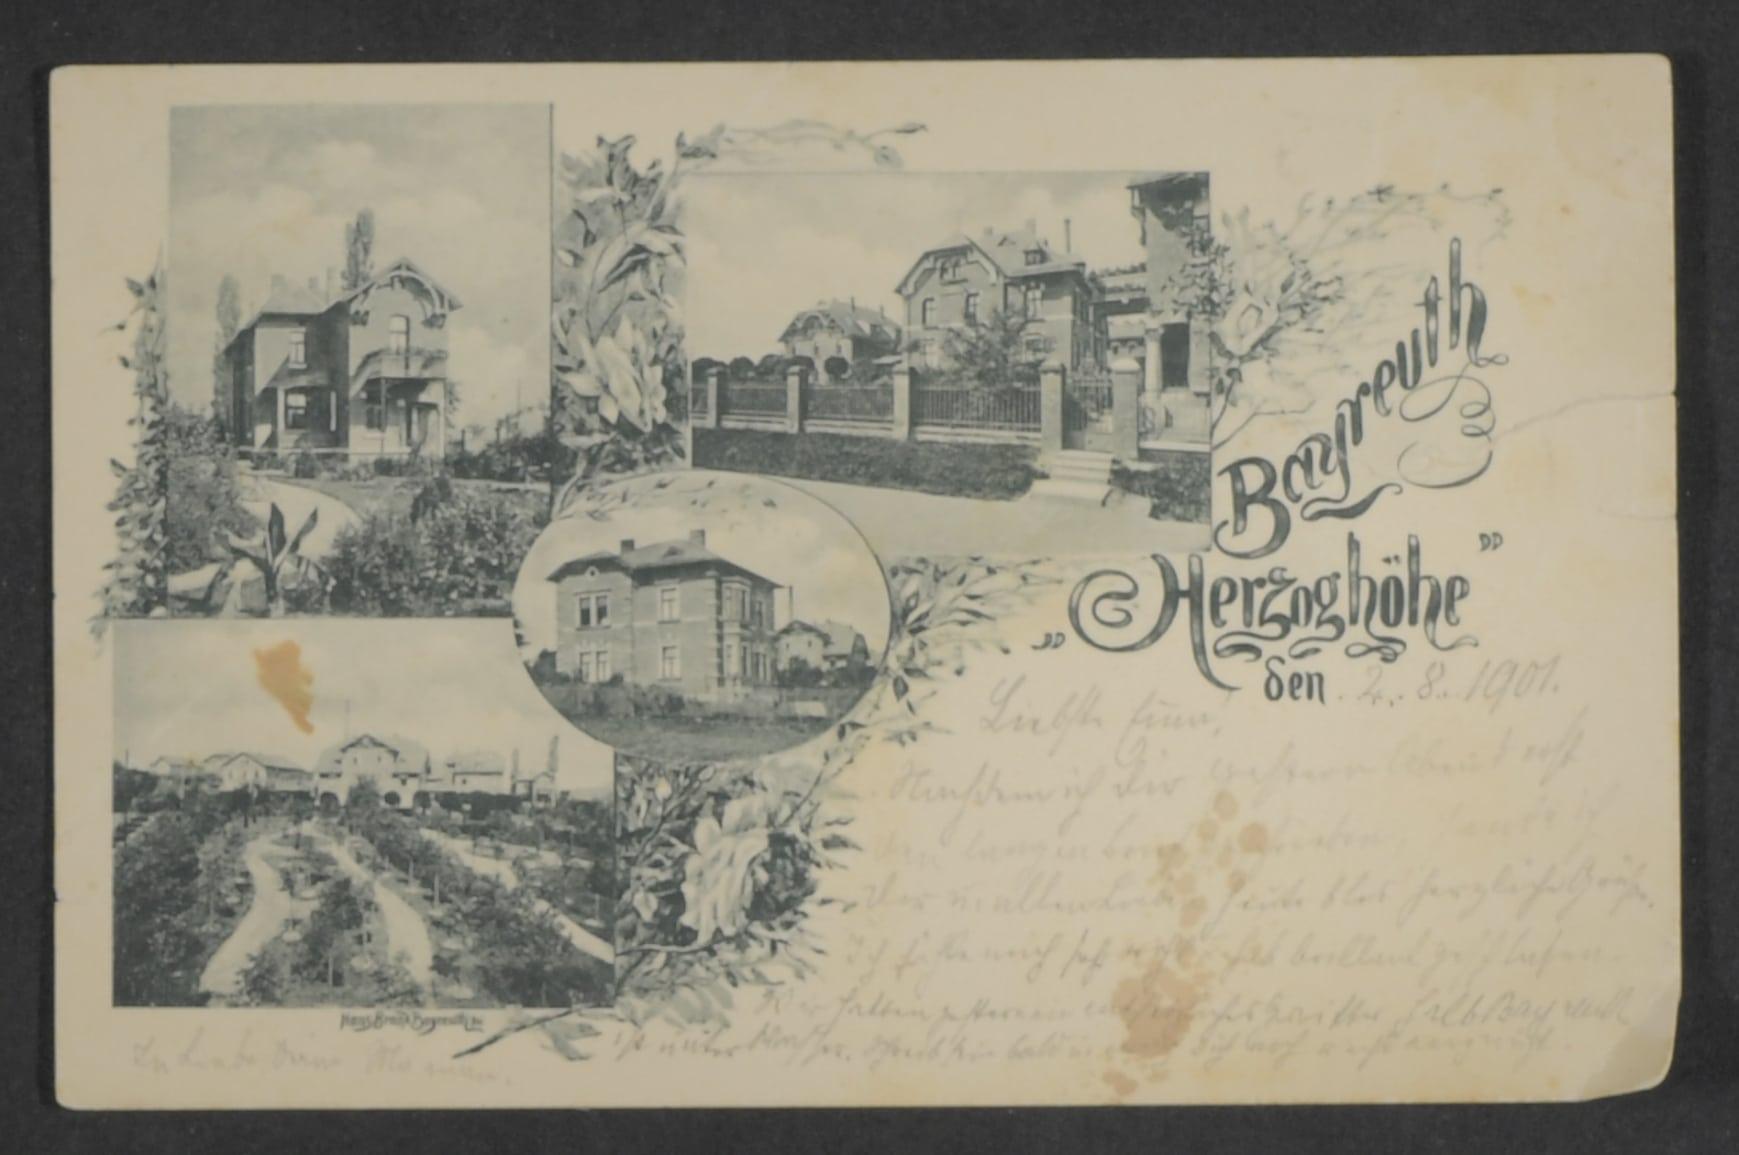 Postkarte Herzoghöhe